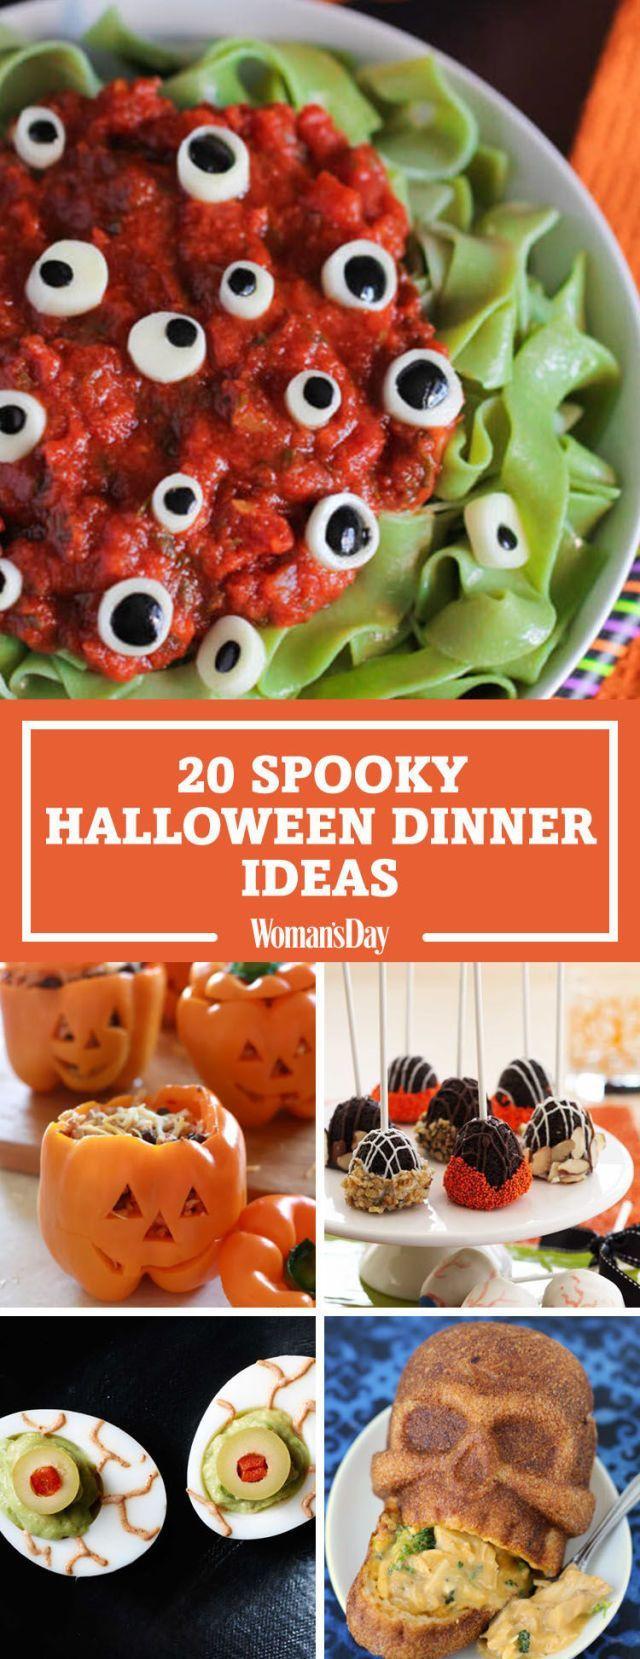 Fun Halloween Dinners  25 Spooky Halloween Dinner Ideas